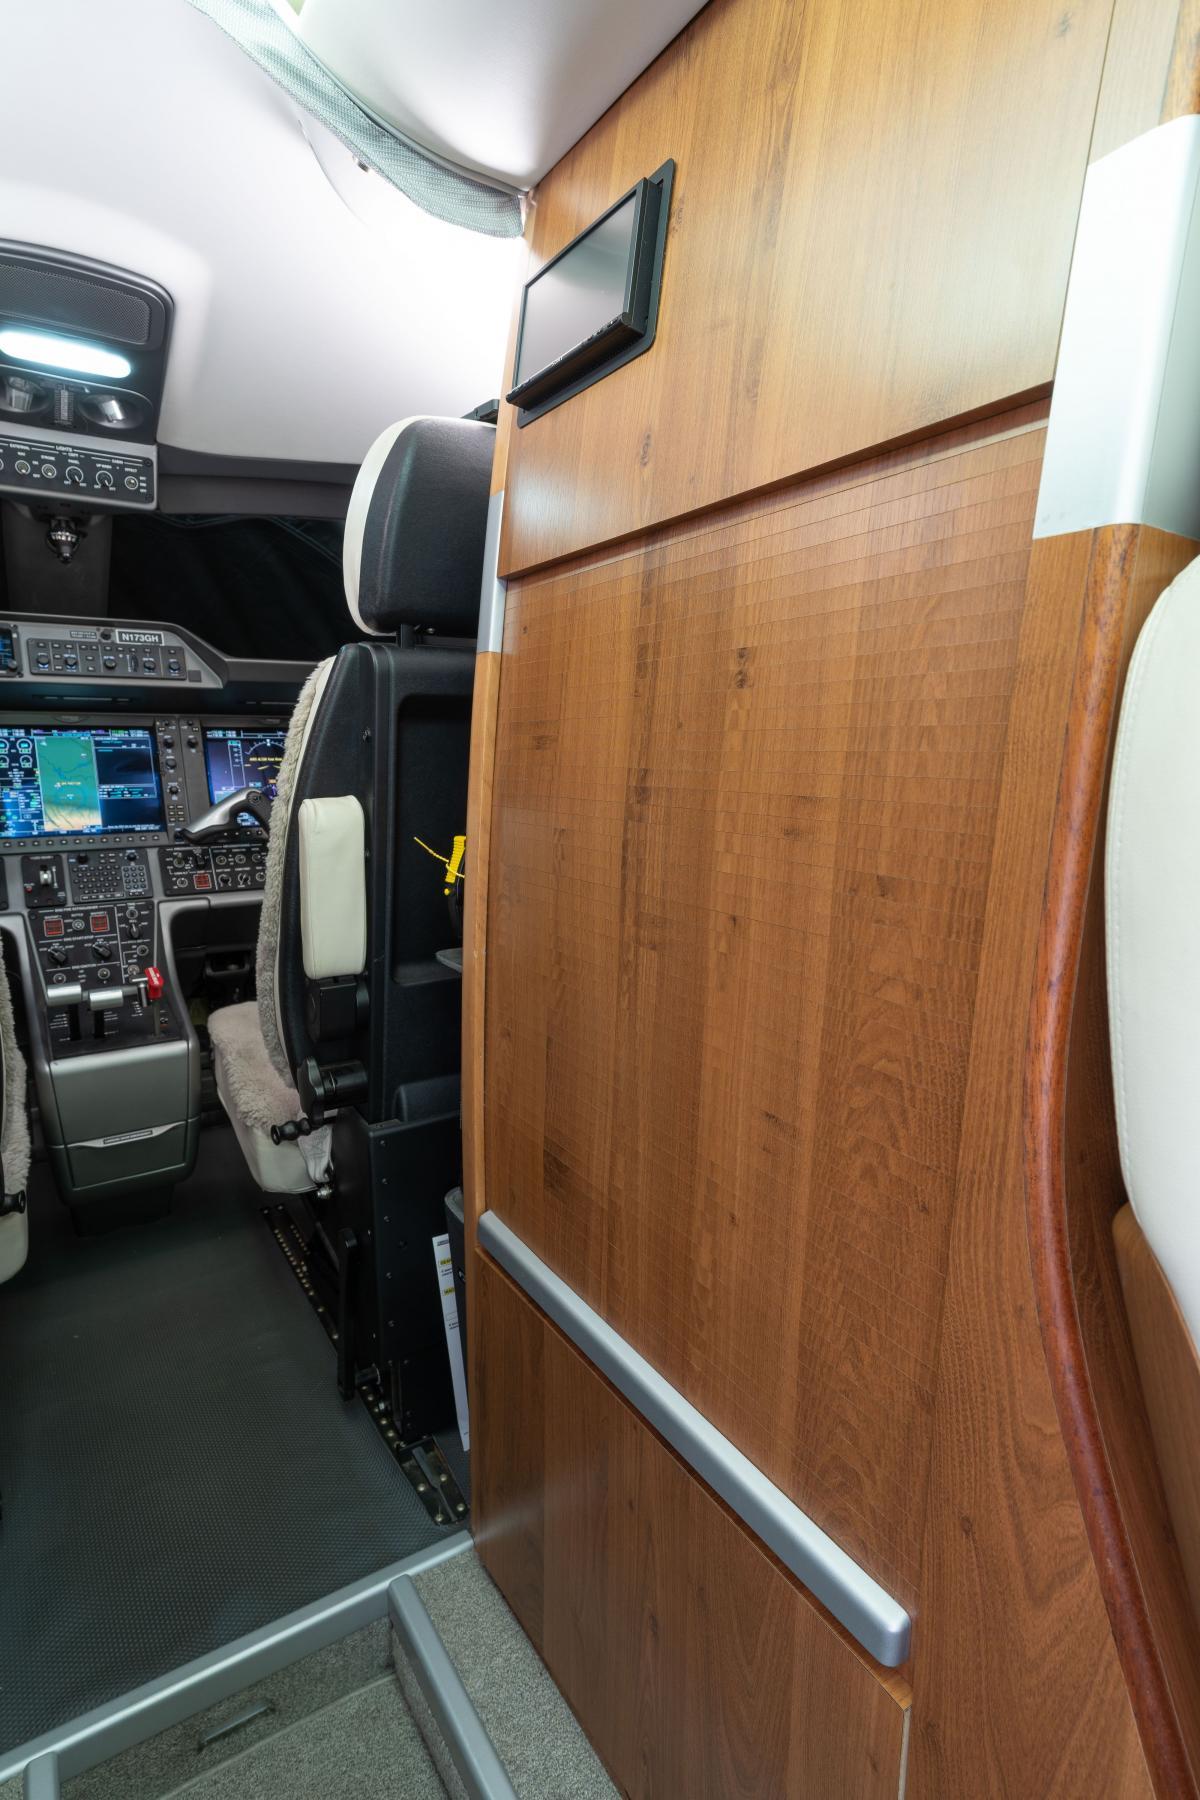 2010 Embraer Phenom 100 Photo 7